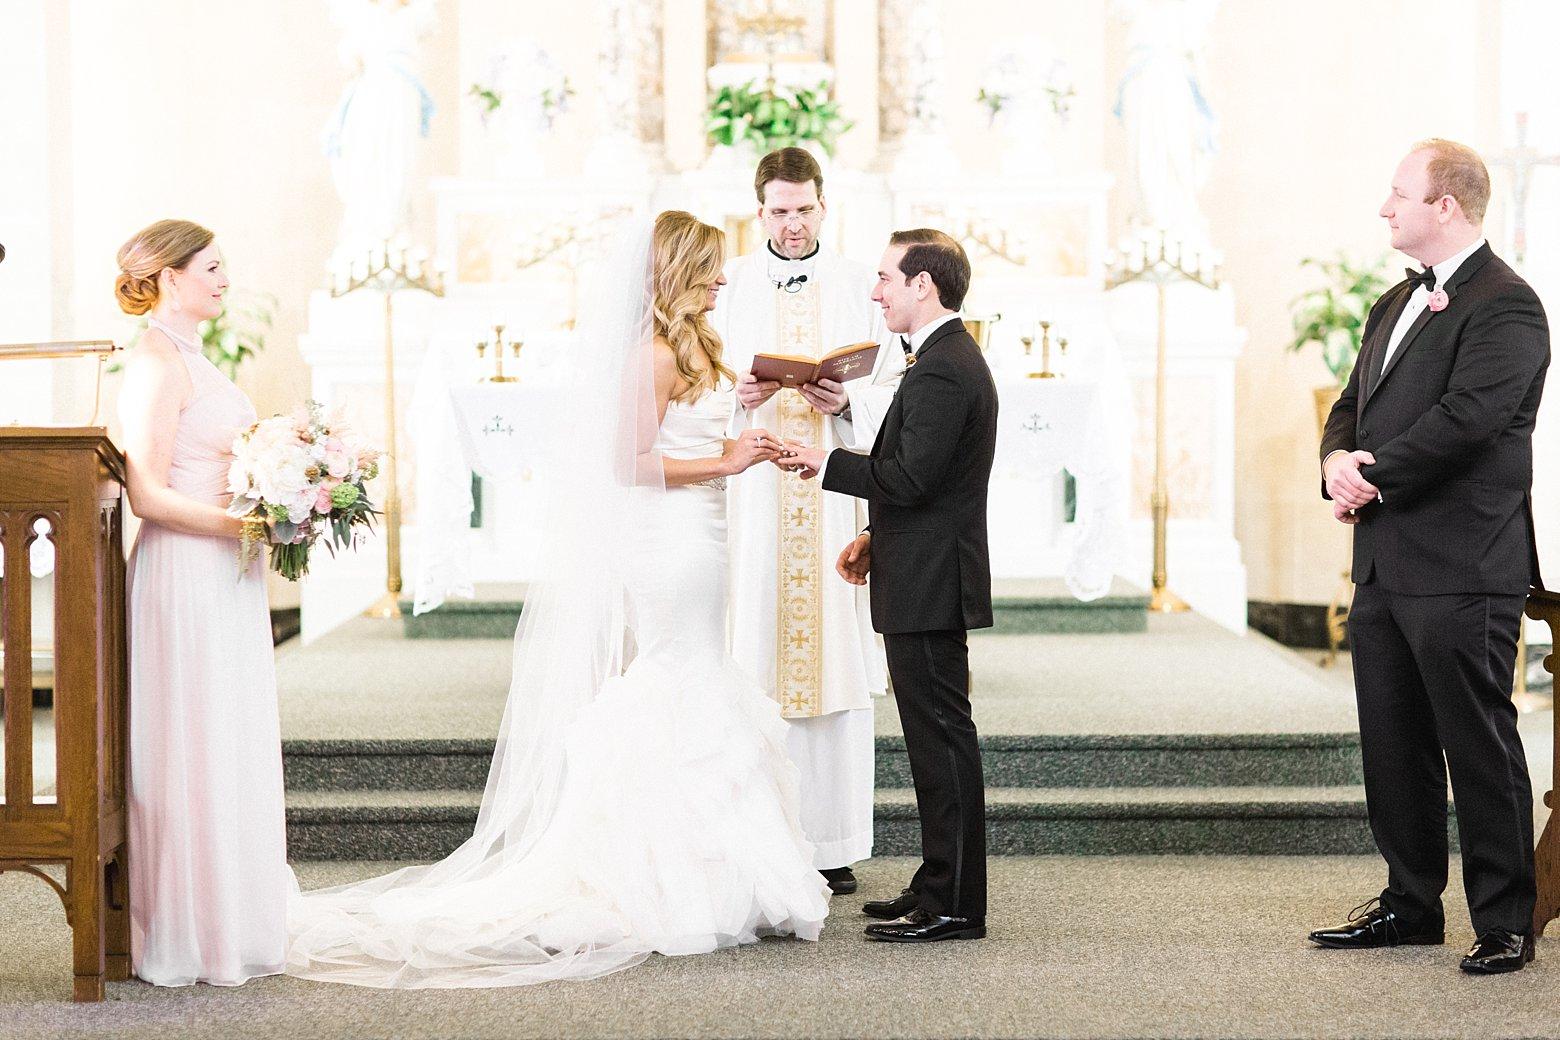 lauren_fair_photography_april_lynn_designs_stasia_matt_spring_cairnwood_estate_wedding_northeast_philadelphia_blush_pink_gold_wedding_invitation_stationery_0053